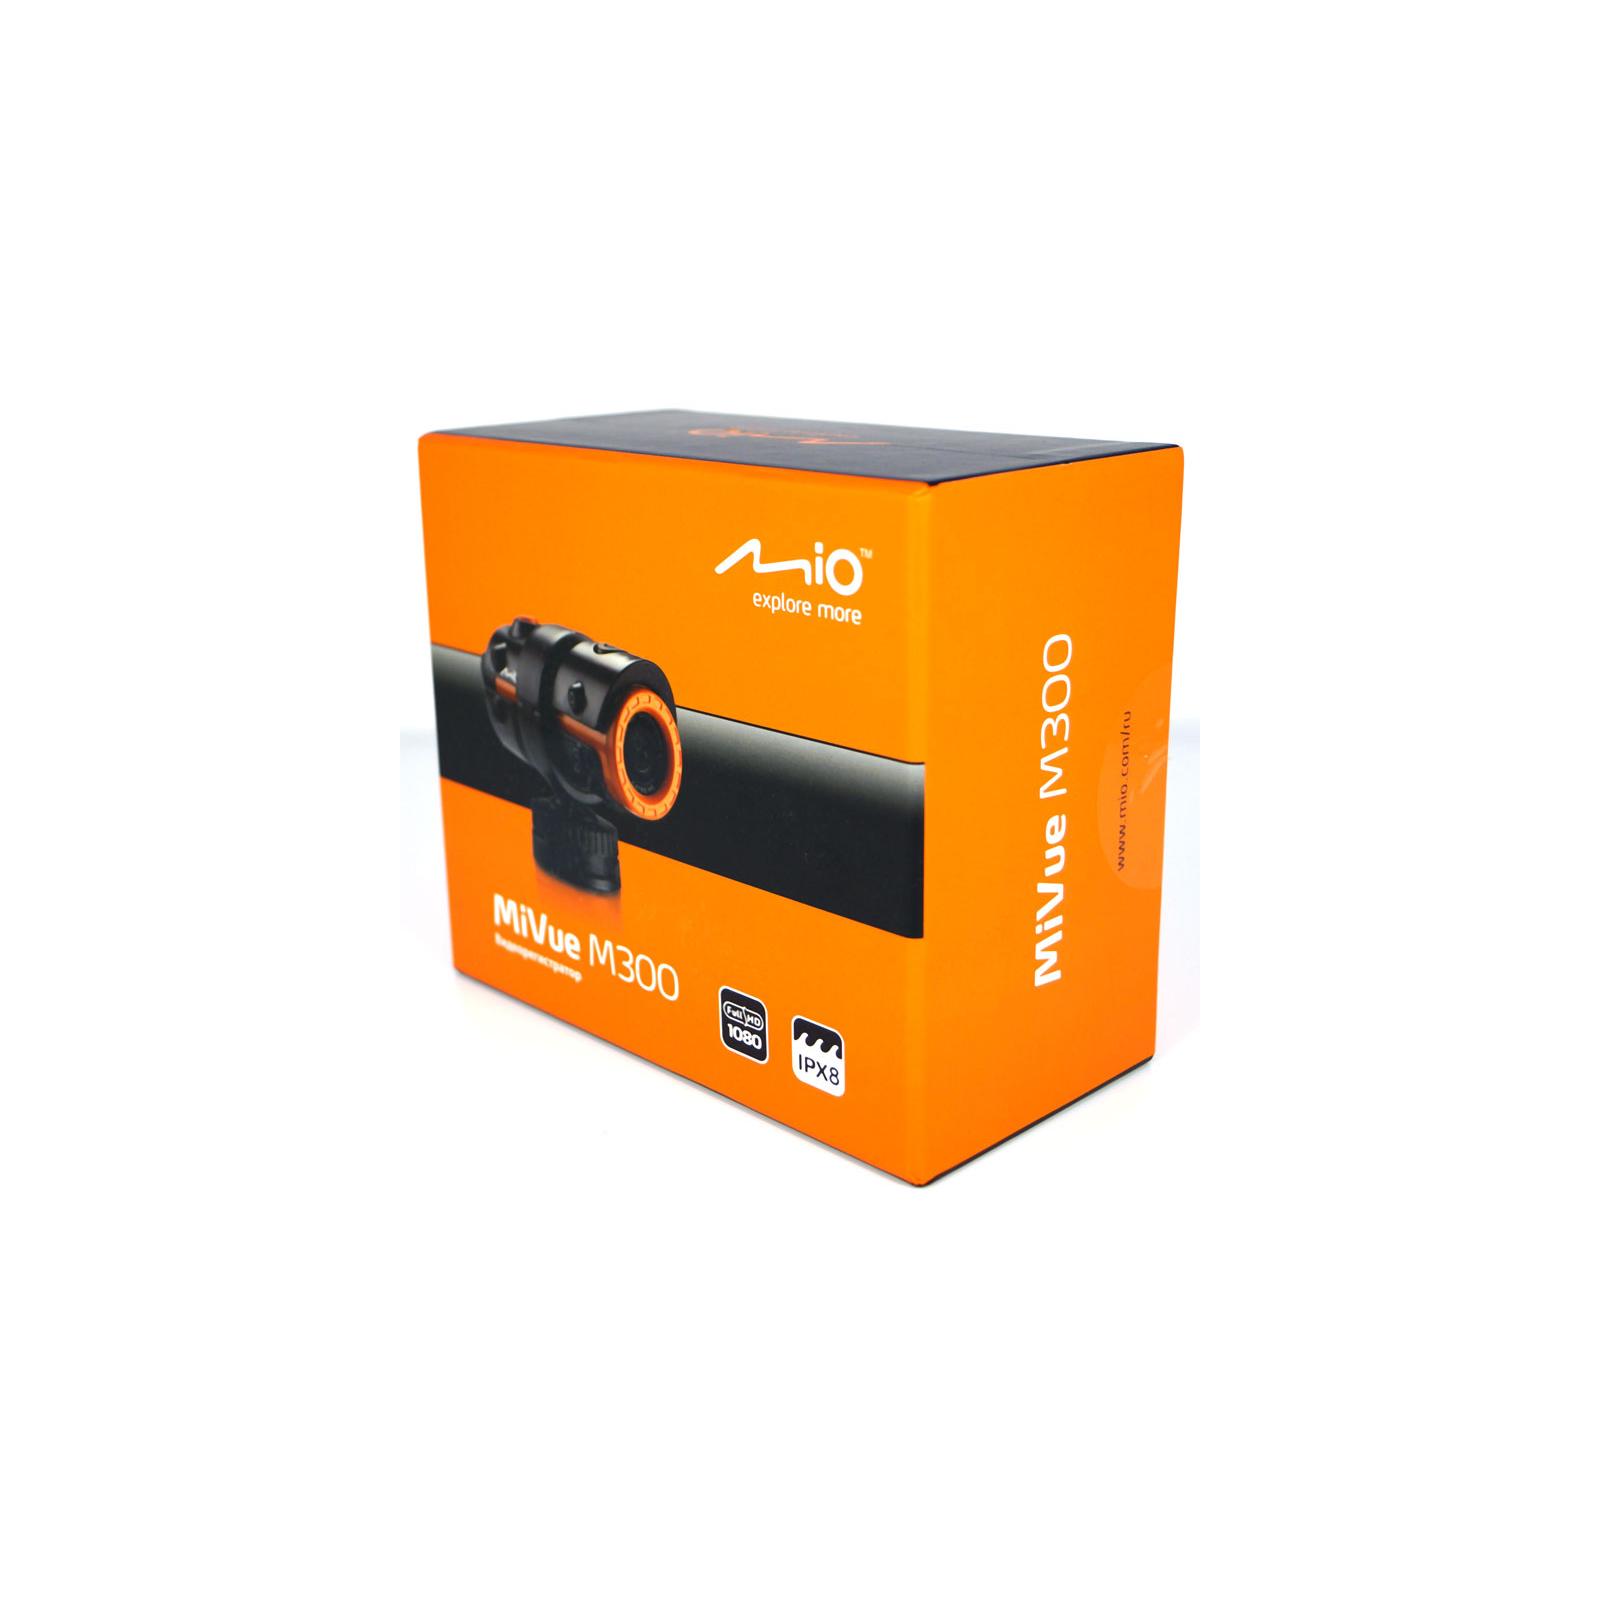 Экшн-камера MIO MiVue M300 изображение 9